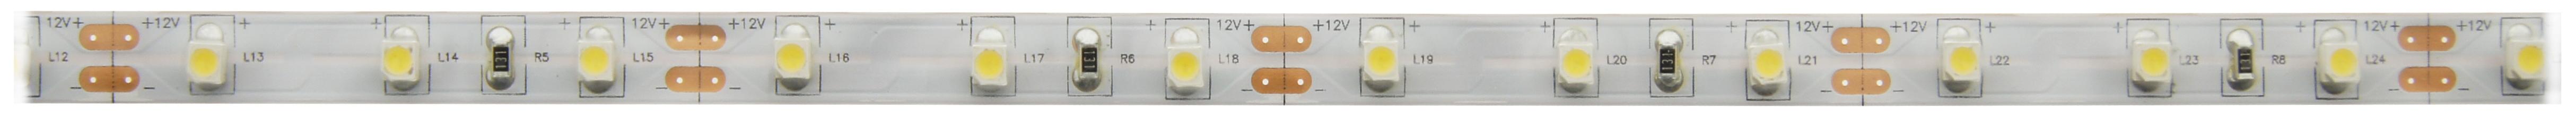 Benzi led, profile, controlere si accesorii gama Silver Line27293